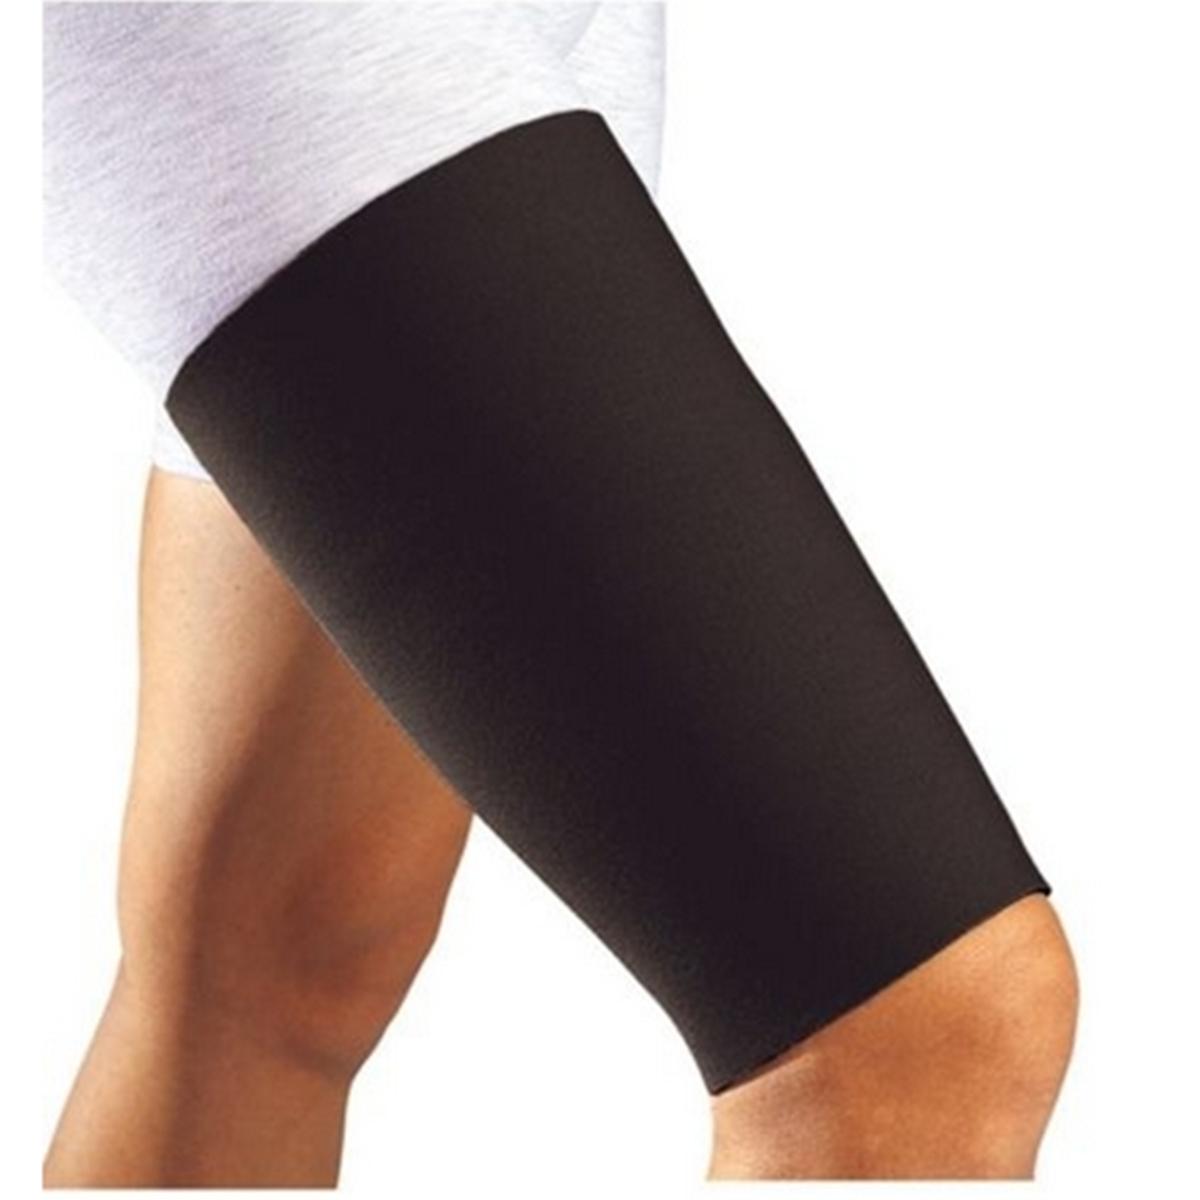 1 Pcs Thigh Sleeve Calf Leg Compression Hamstring Groin ...